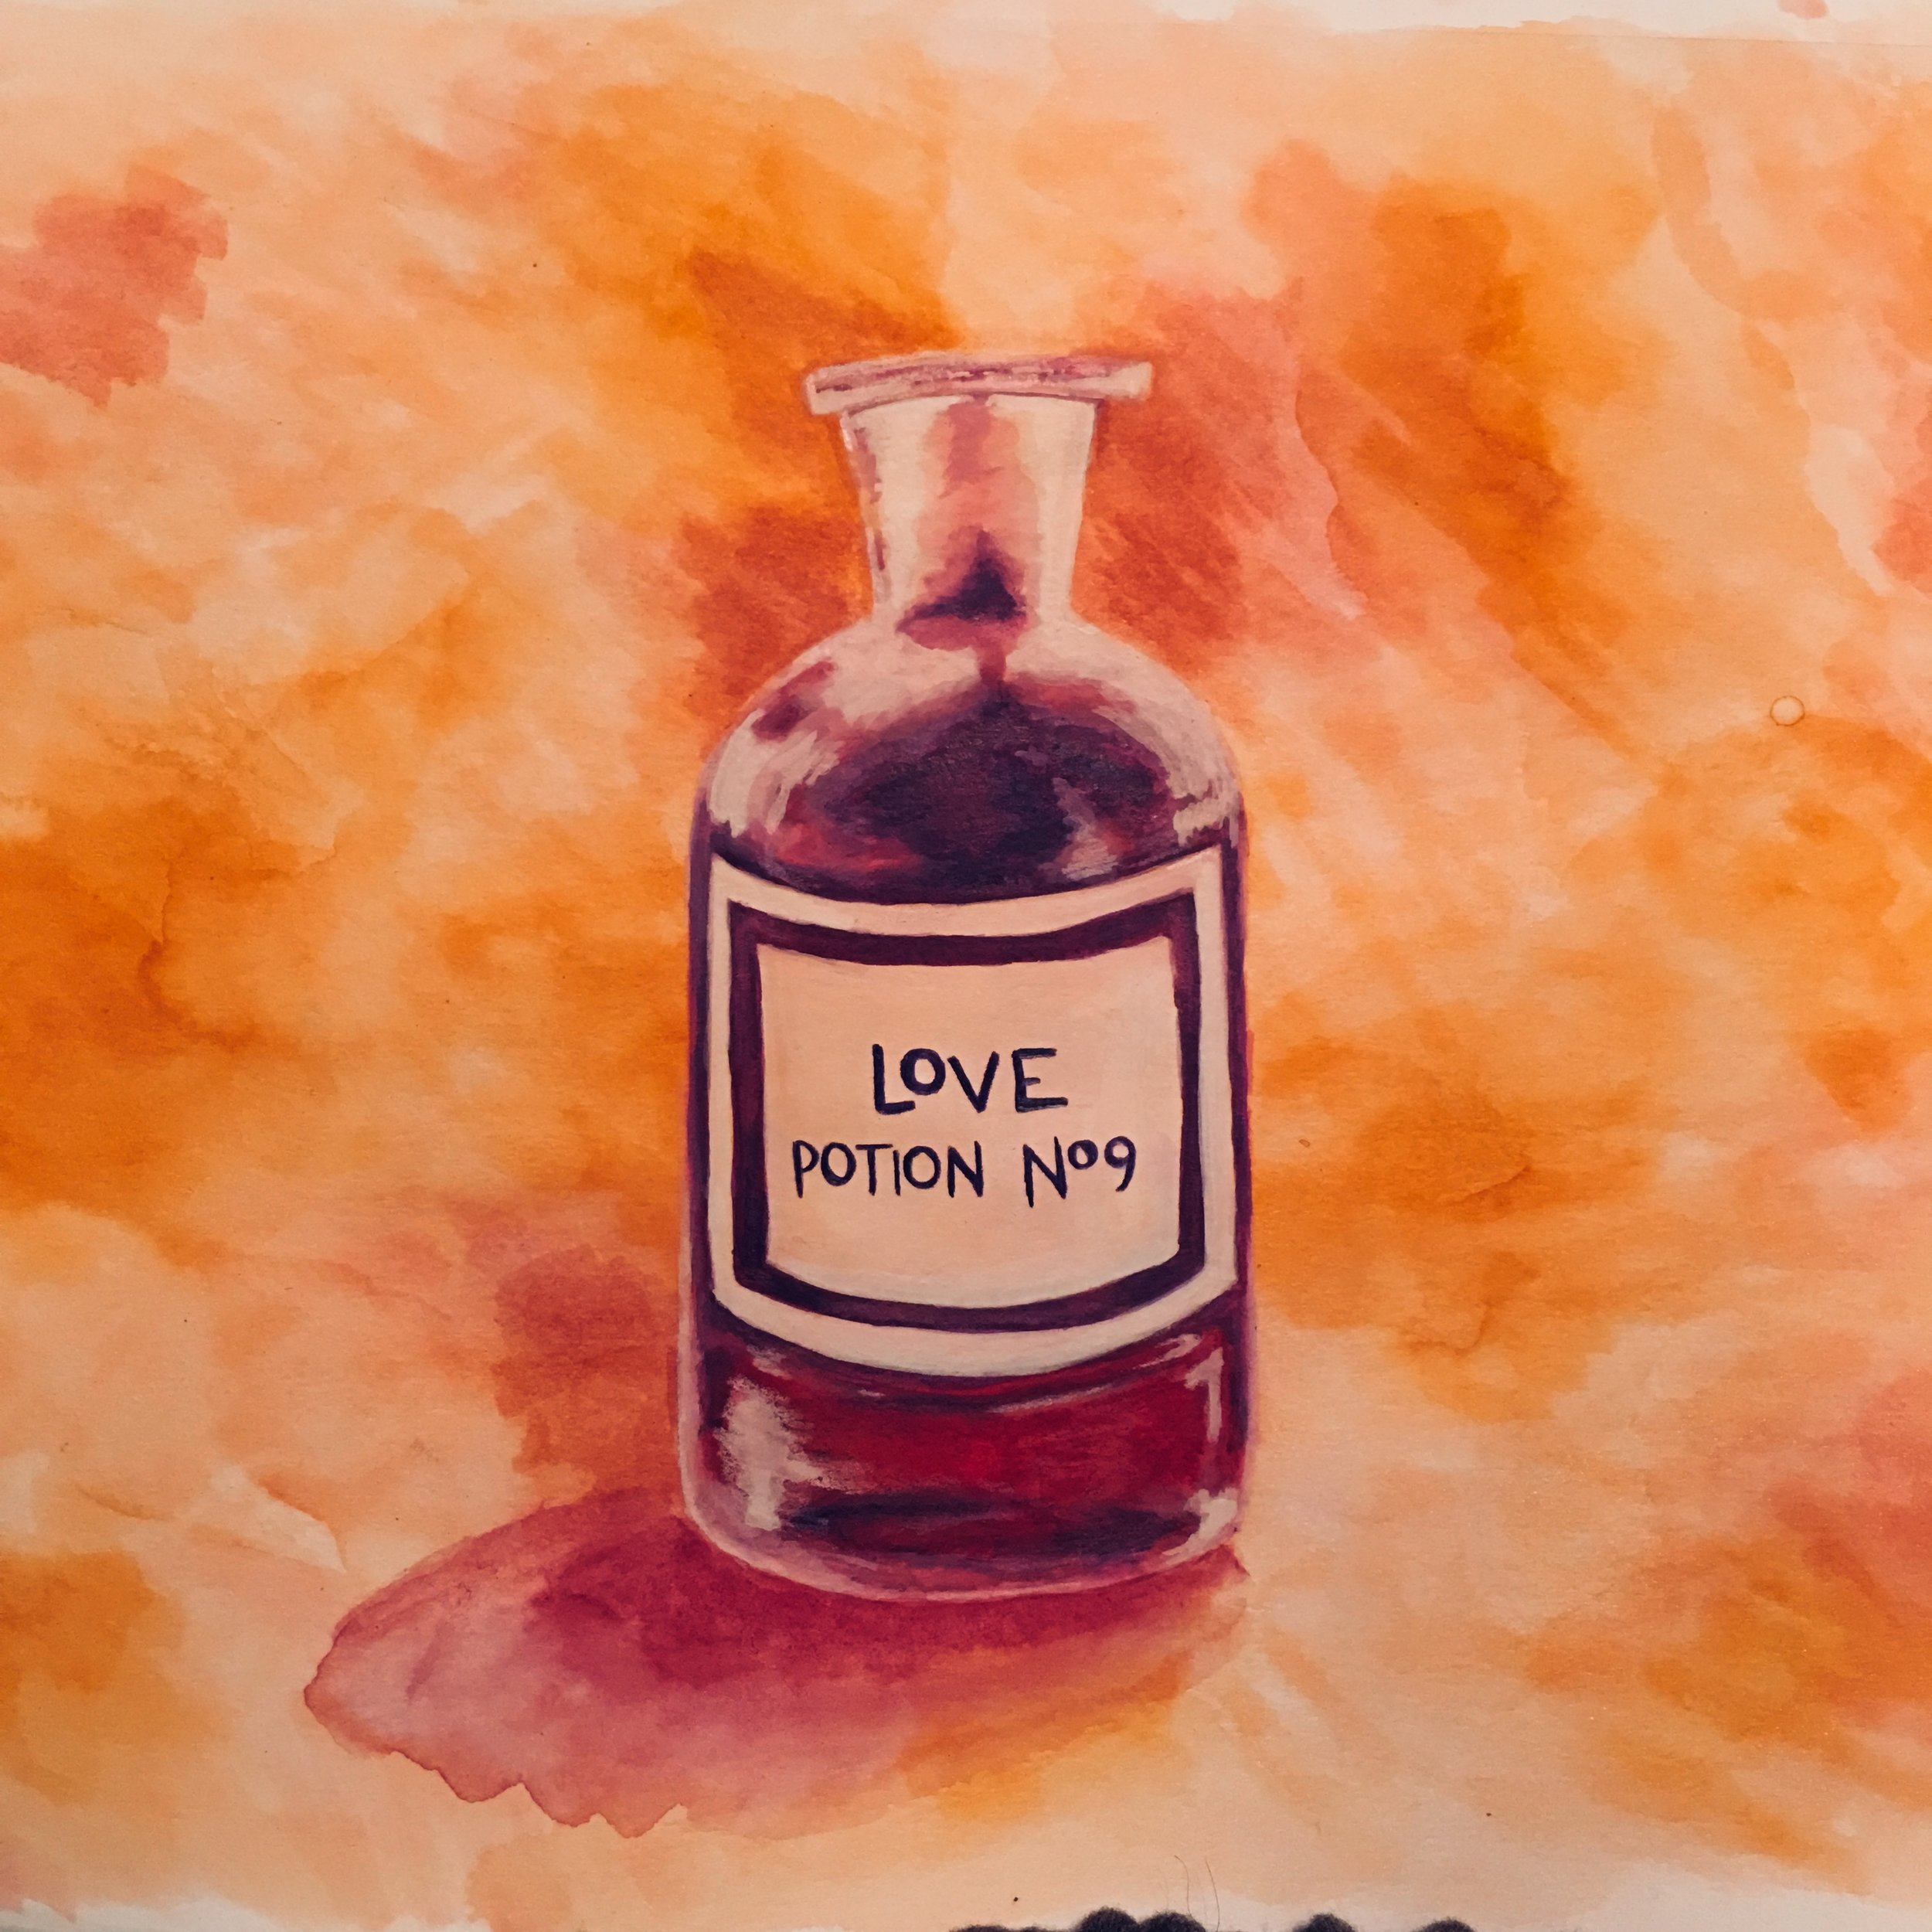 2018: Love Potion